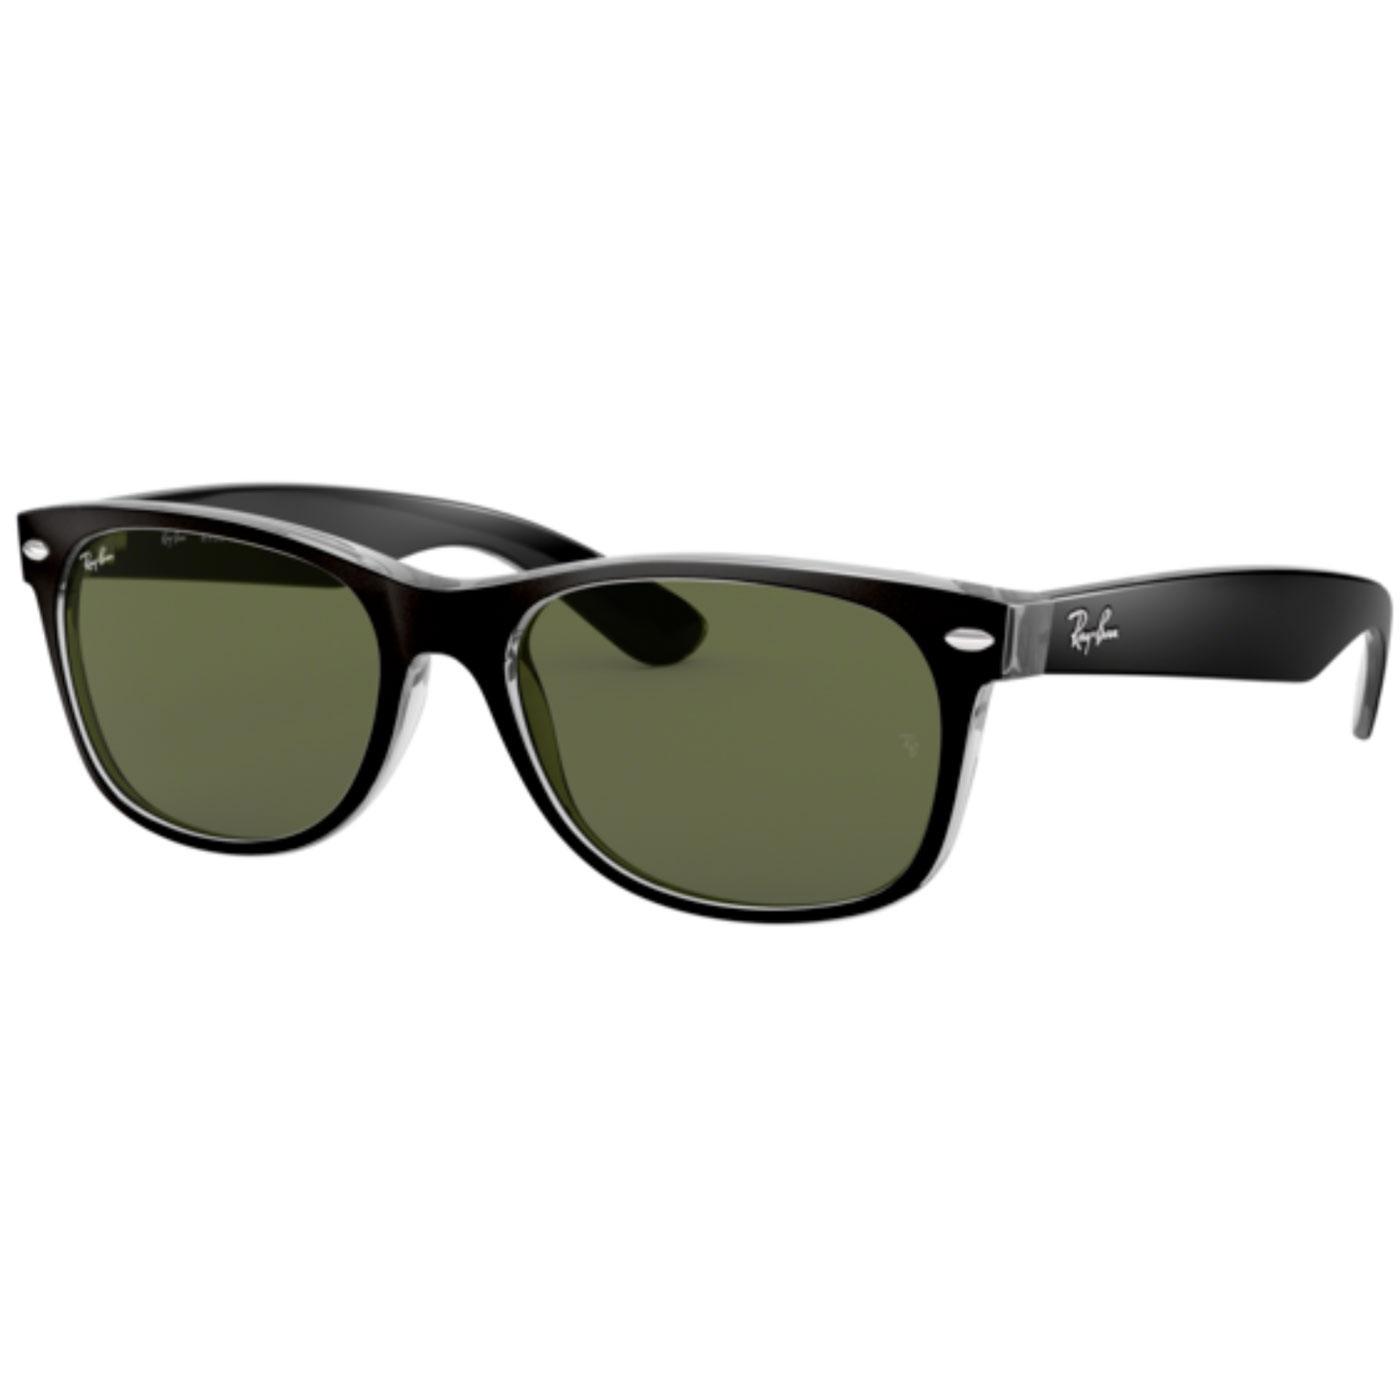 New Wayfarer RAY-BAN Retro Mod Wayfarer Sunglasses